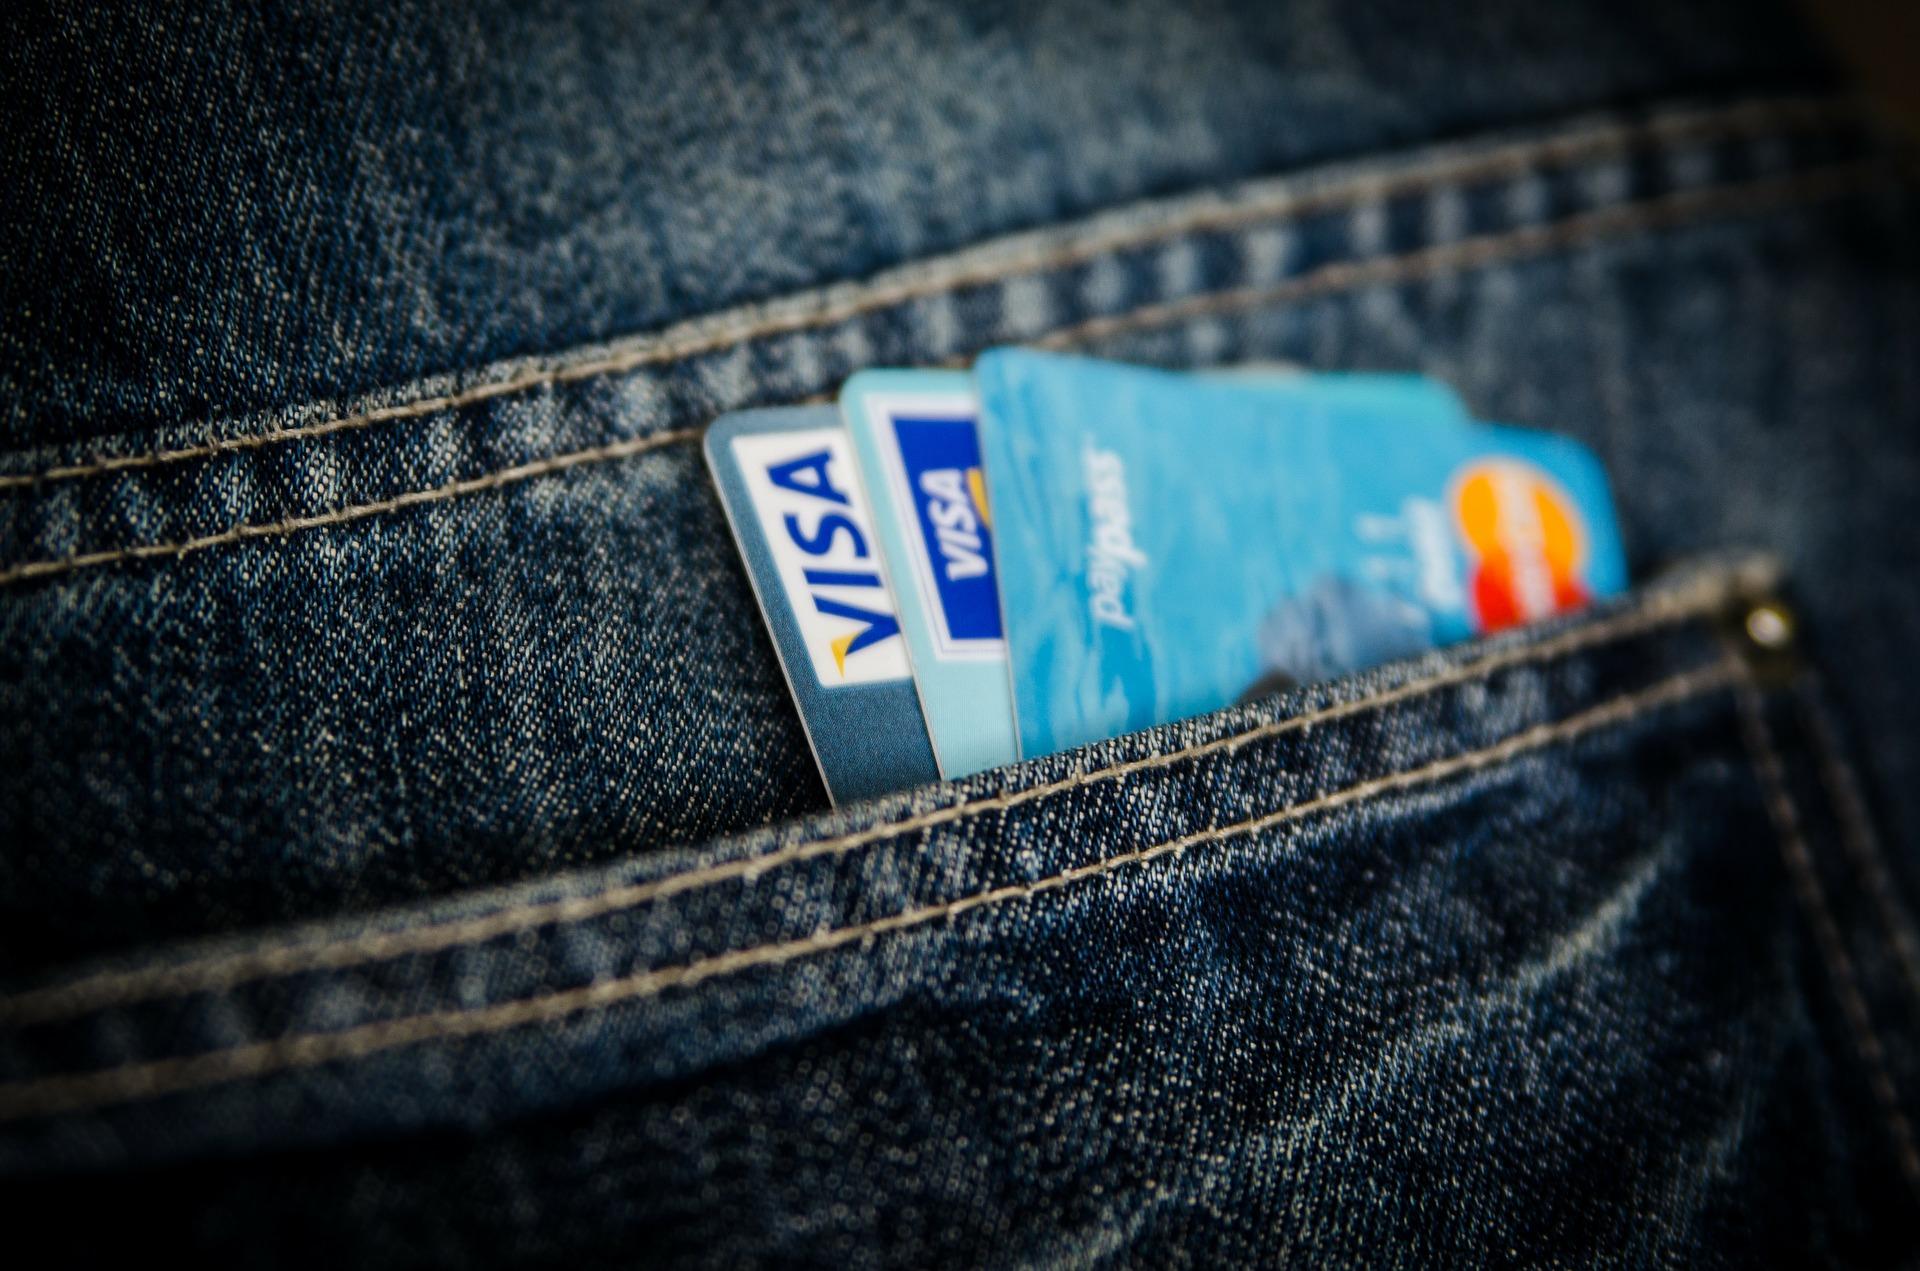 Visa emite un informe NFT después de comprar CryptoPunk, cita Ethereum y Flow Blockchain